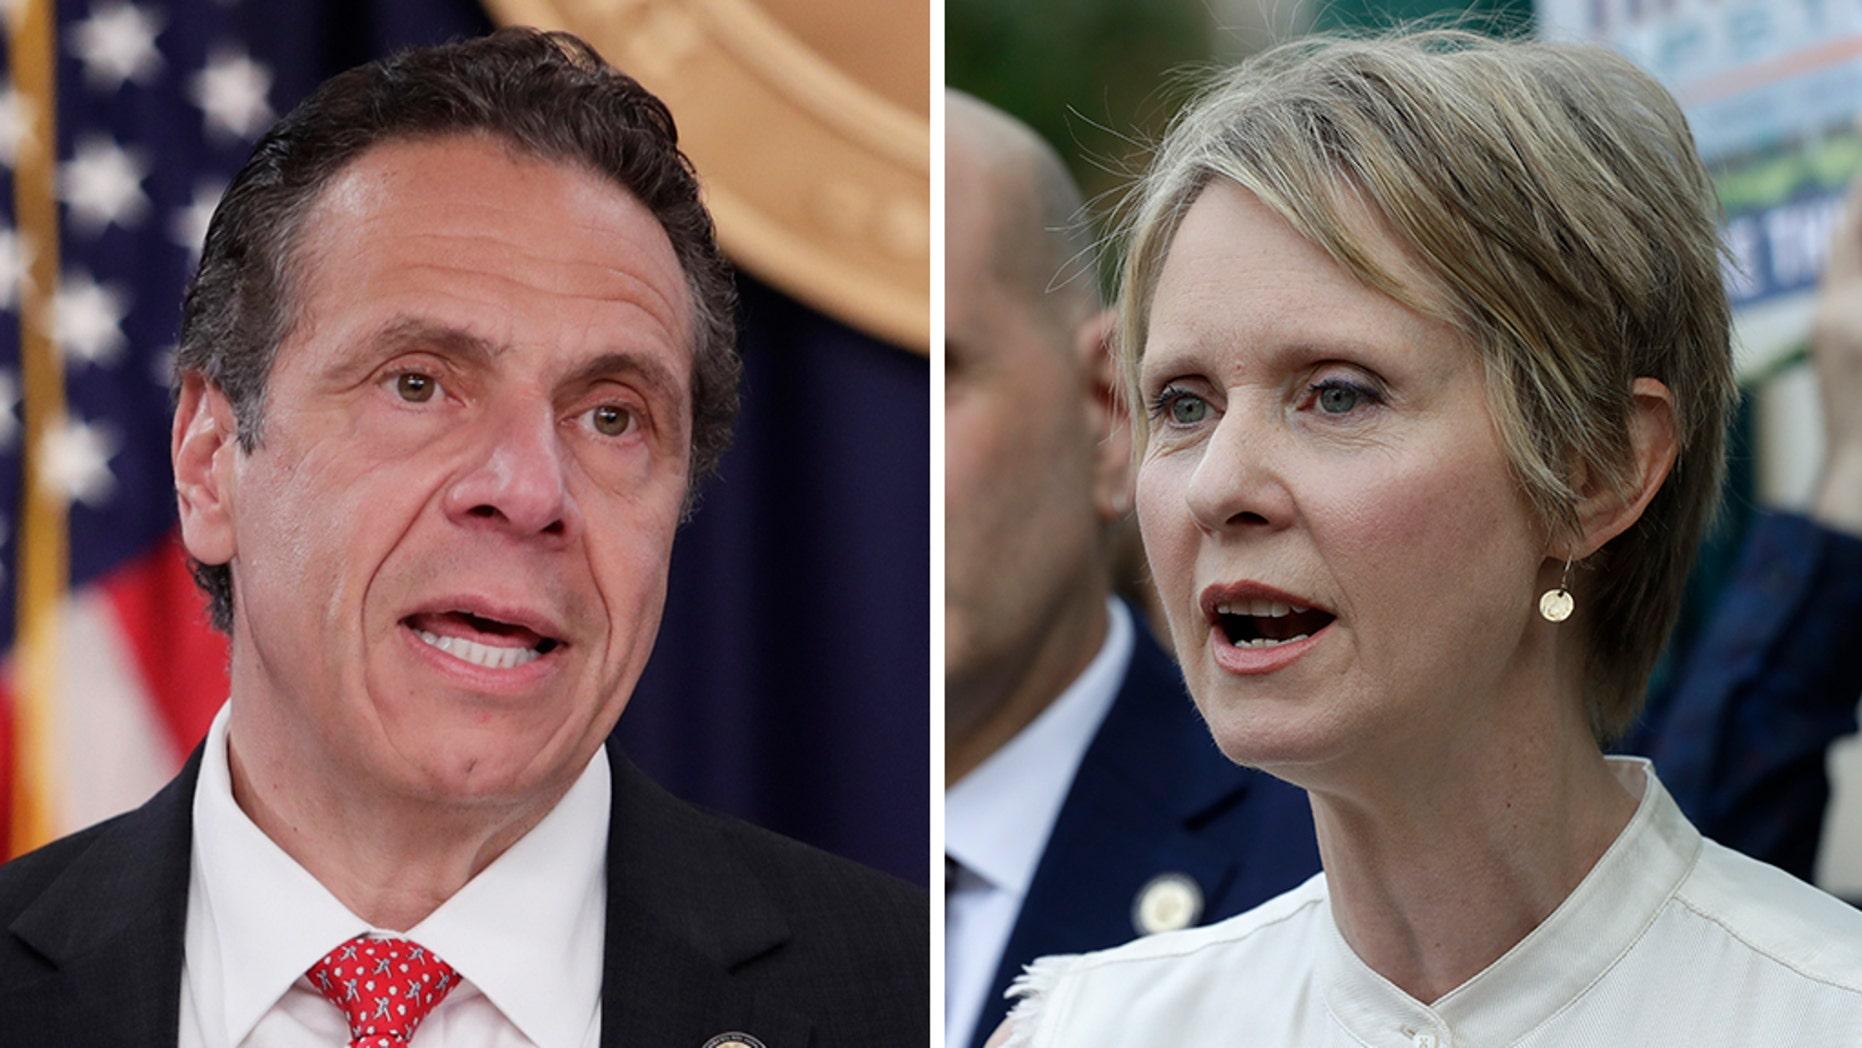 New York Gov. Andrew Cuomo is scheduled to debate gubernatorial candidate Cynthia Nixon in Long Island on Wednesday night.